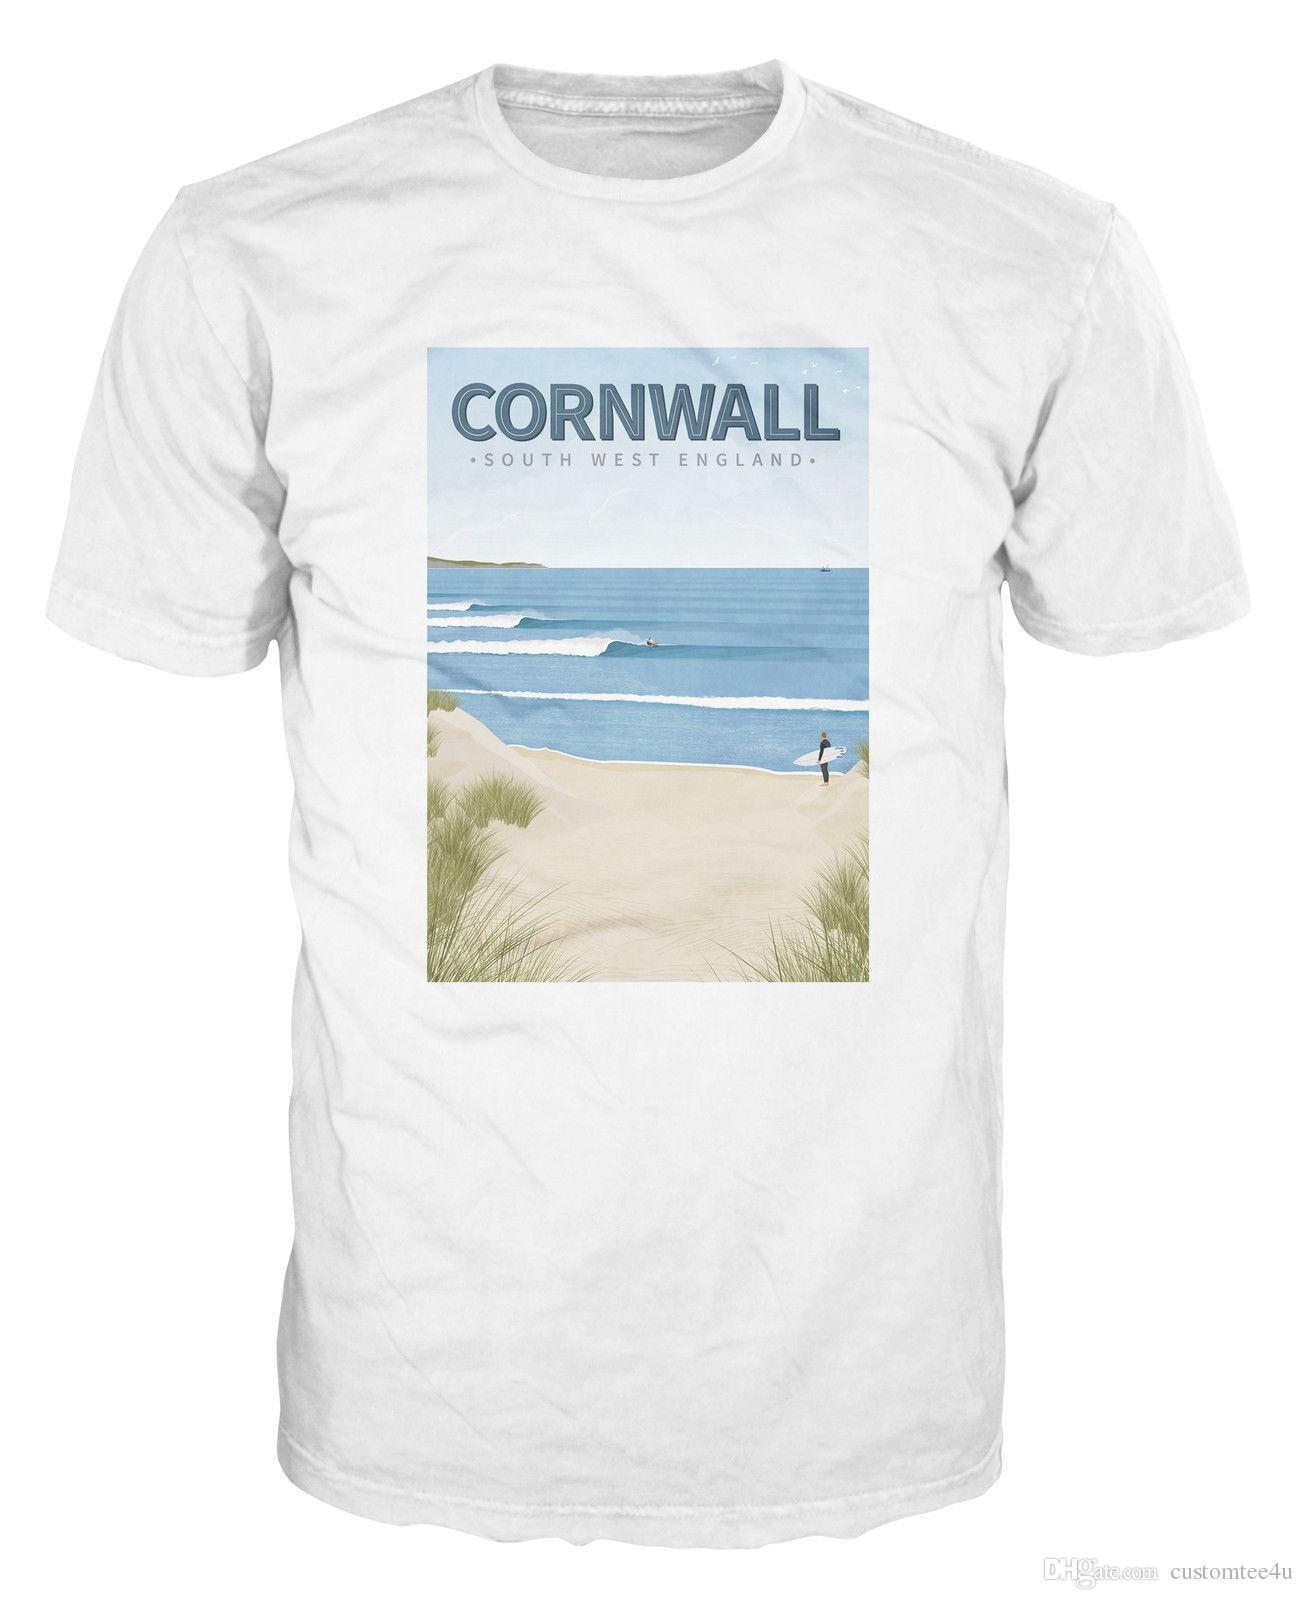 94c631c1a1 Cornwall Surfing Southwest Beach Surf Uk England T Shirt T Shirt For Men  Design Short Sleeve Crewneck Cotton XXXL Team Tee Shirts Humor Shirts  Offensive T ...